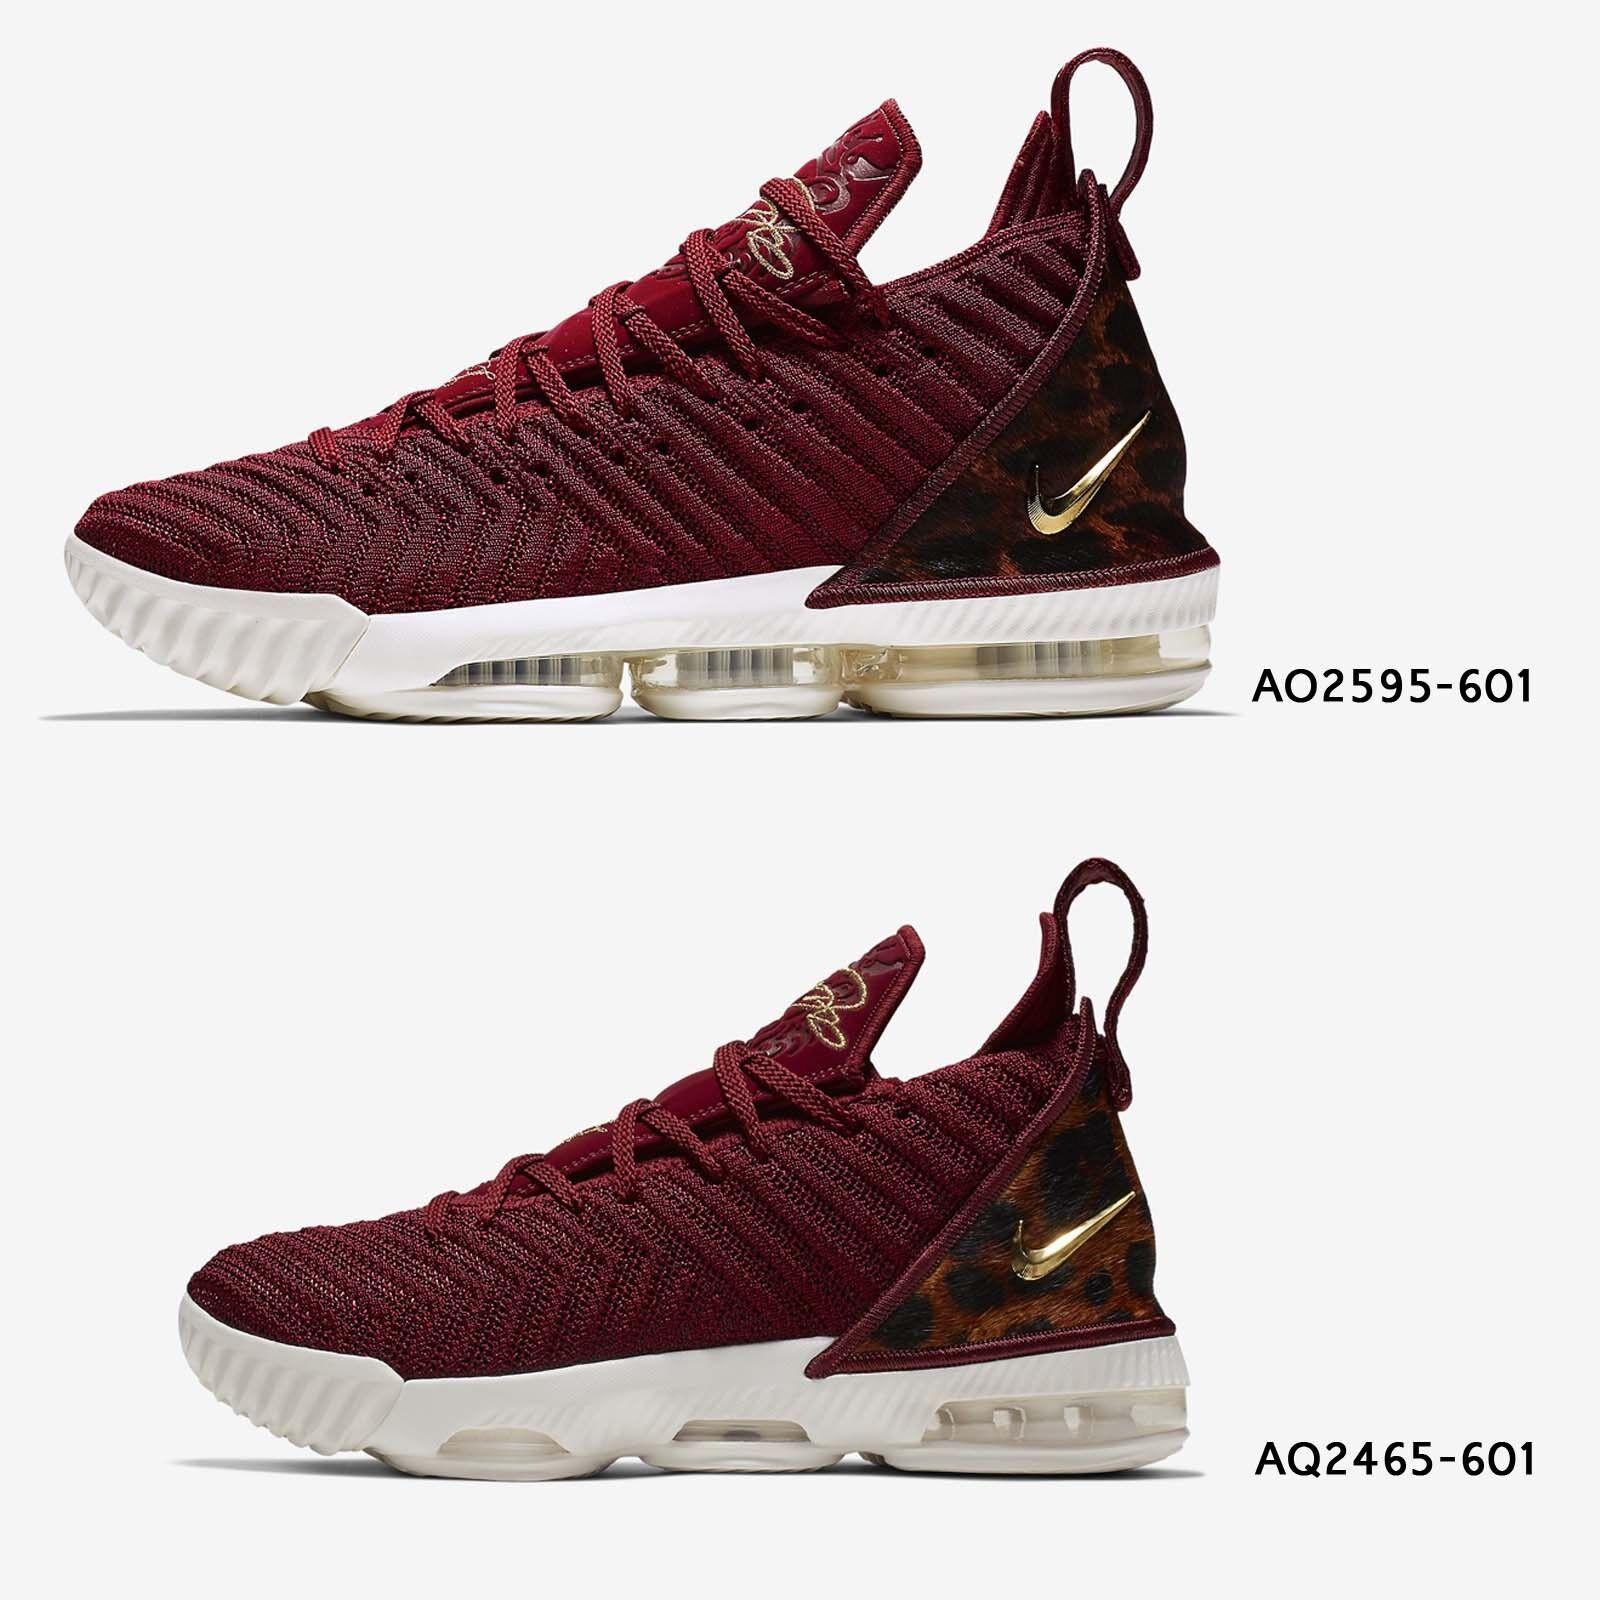 Nike LeBron XVI EP 16 King James Team rosso Leopard Mens donna GS scarpe Pick 1